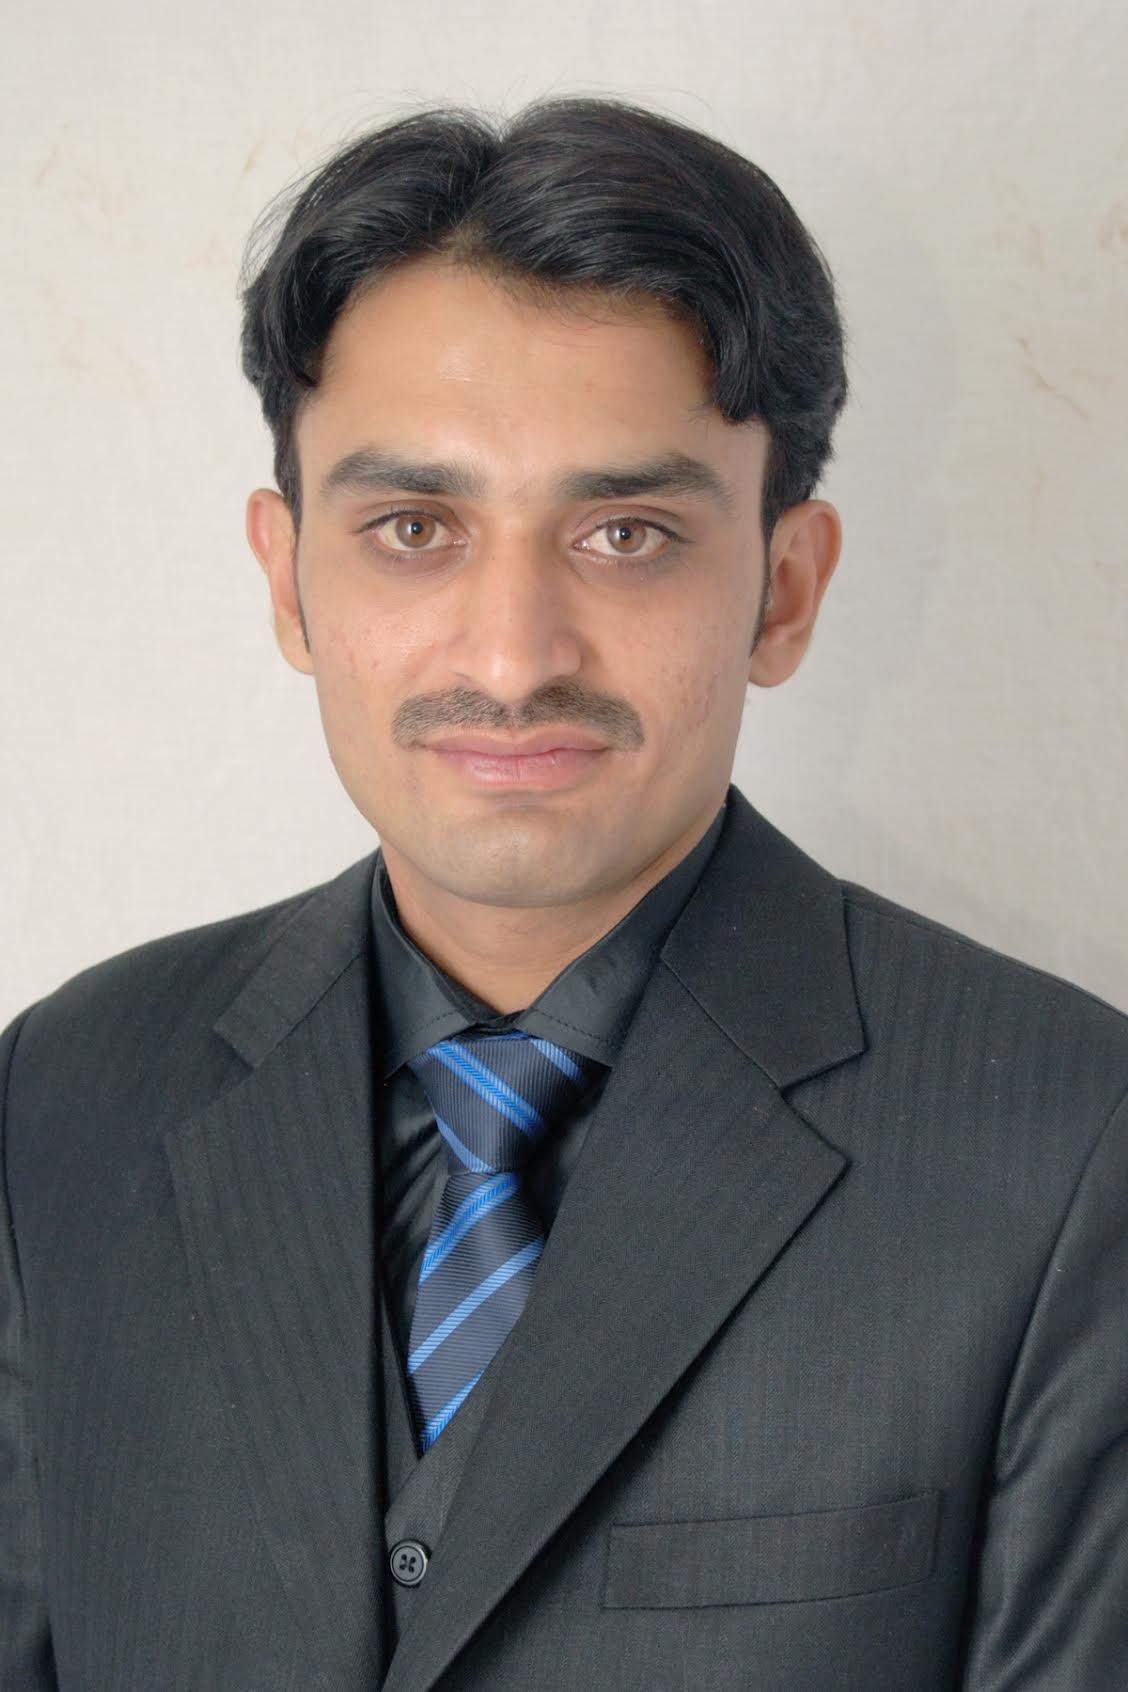 Syed <b>Asim Shahzad</b> Management, Data Entry, Microsoft, Education & Tutoring, ... - 126115_1_87455